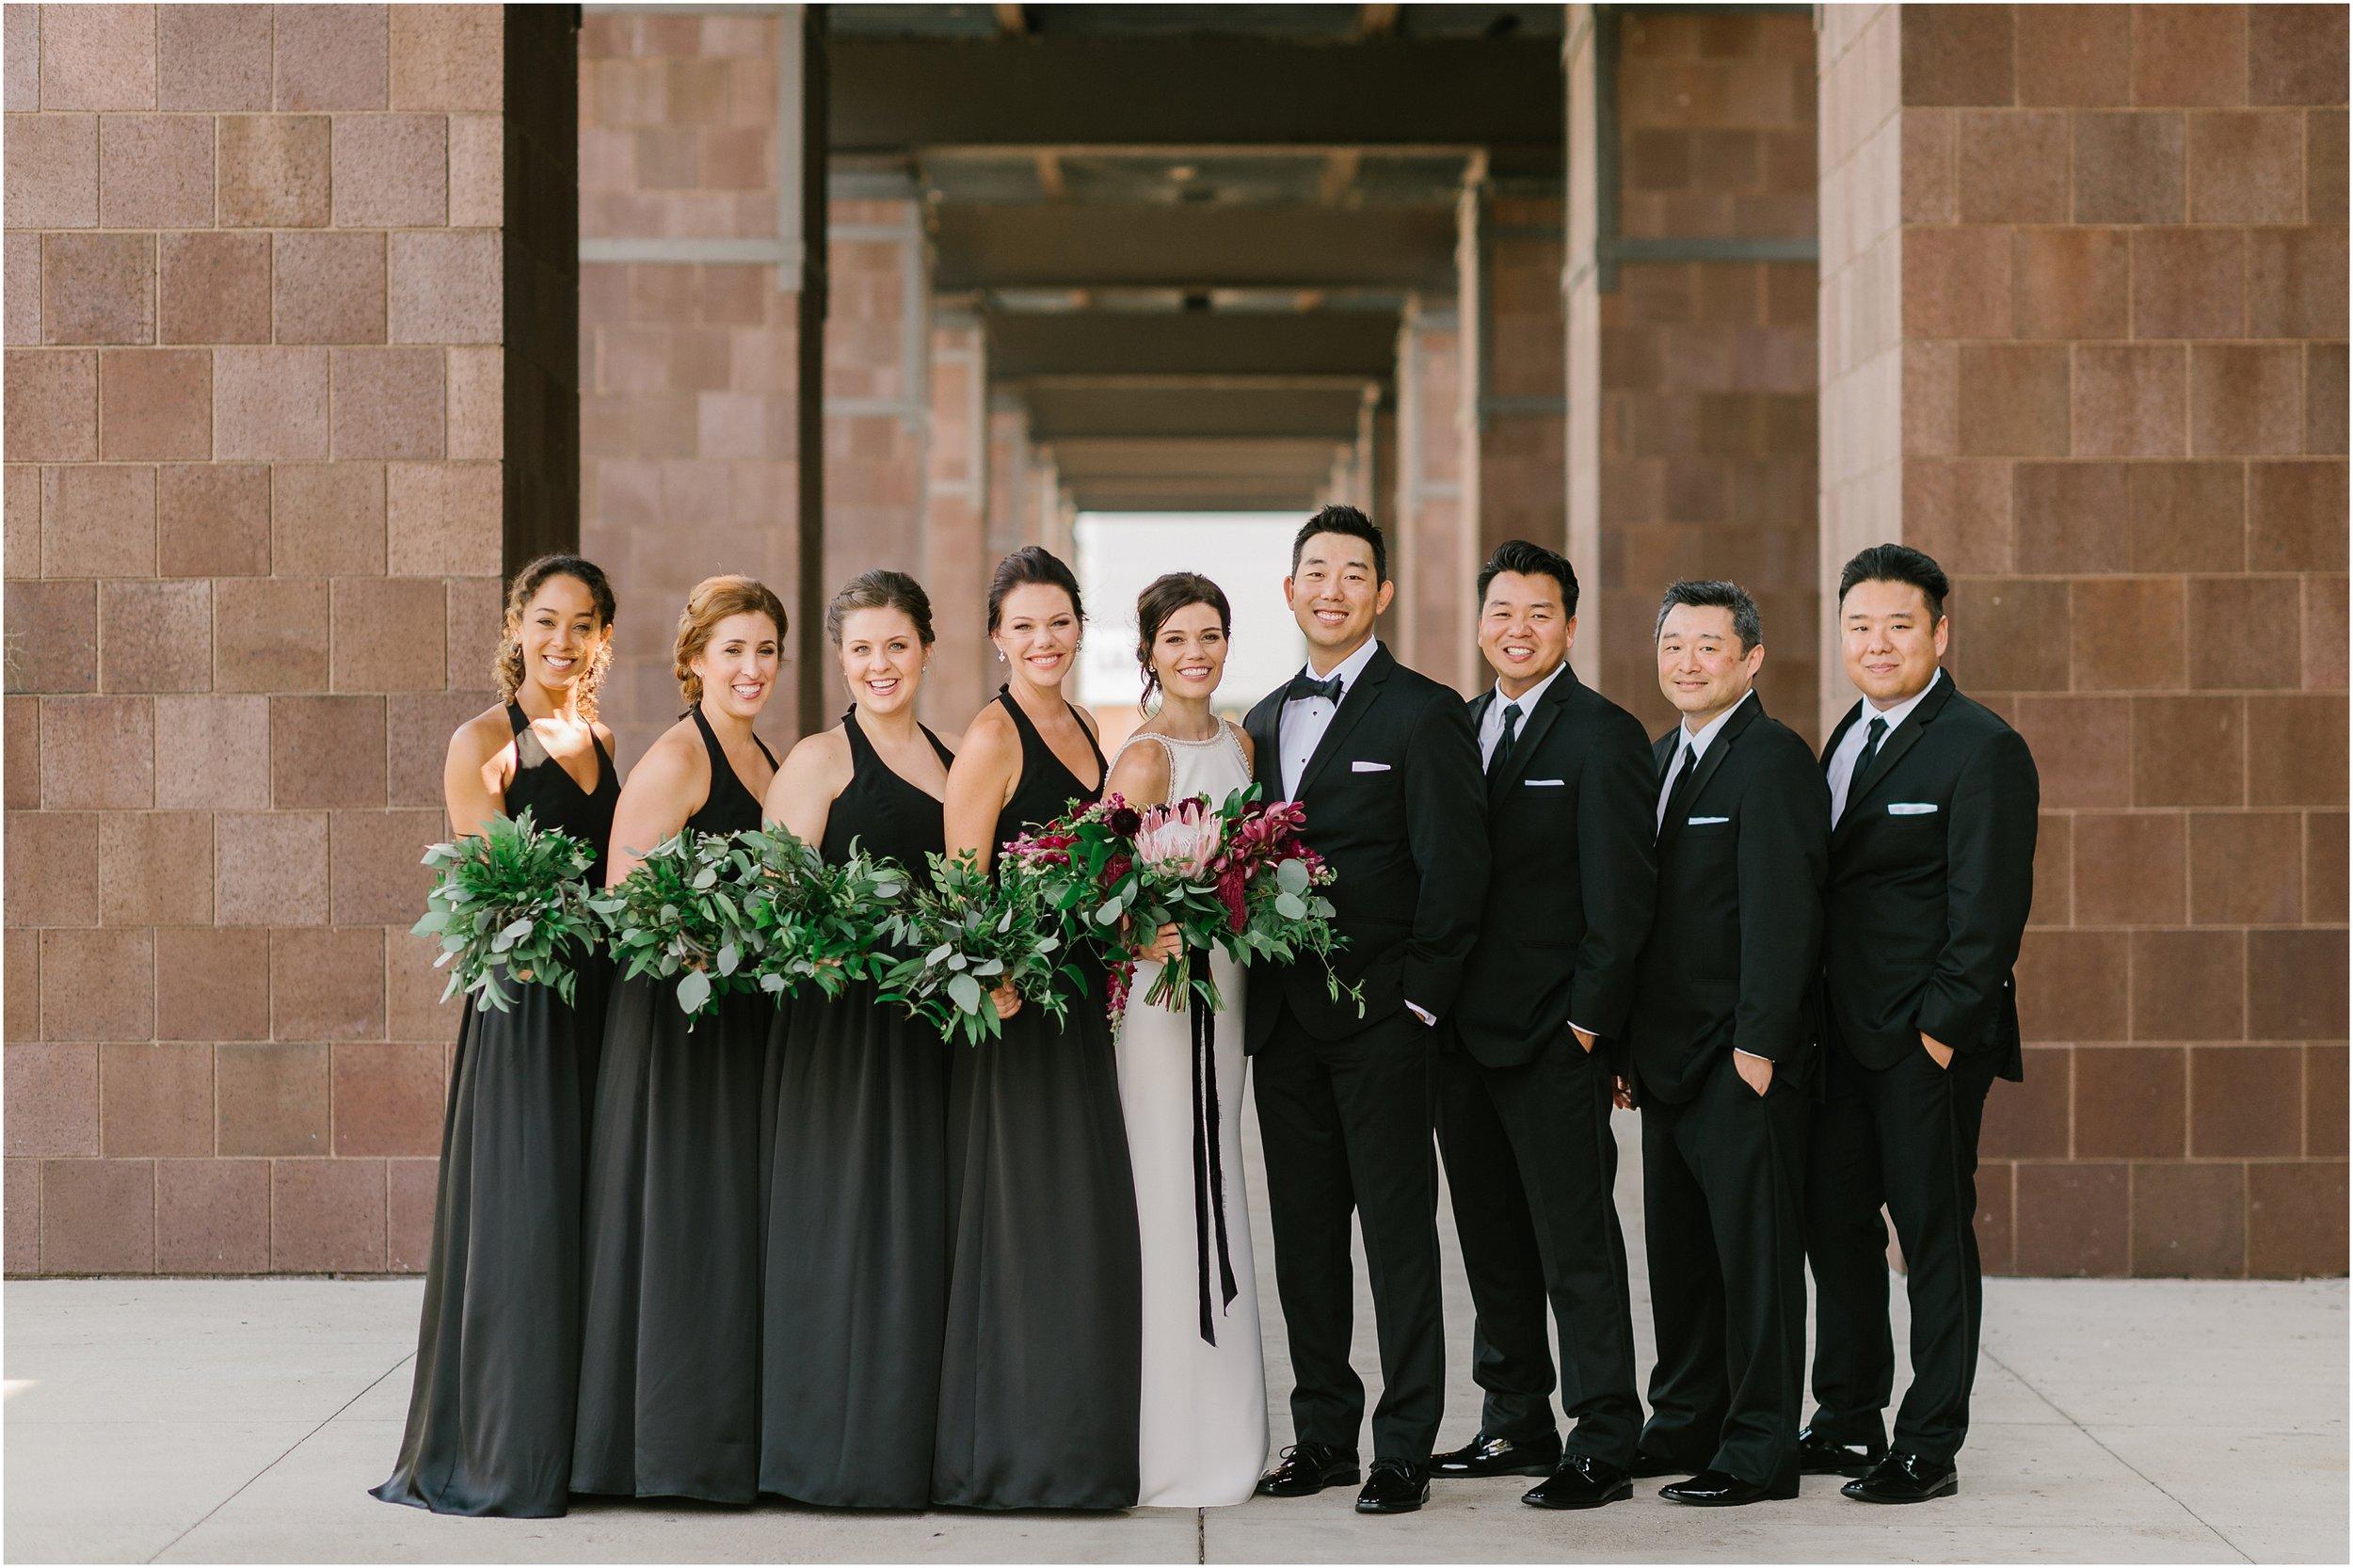 Rebecca_Shehorn_Photography_Indianapolis Wedding Photographer Sycamore at Mallow Run Wedding_9751.jpg